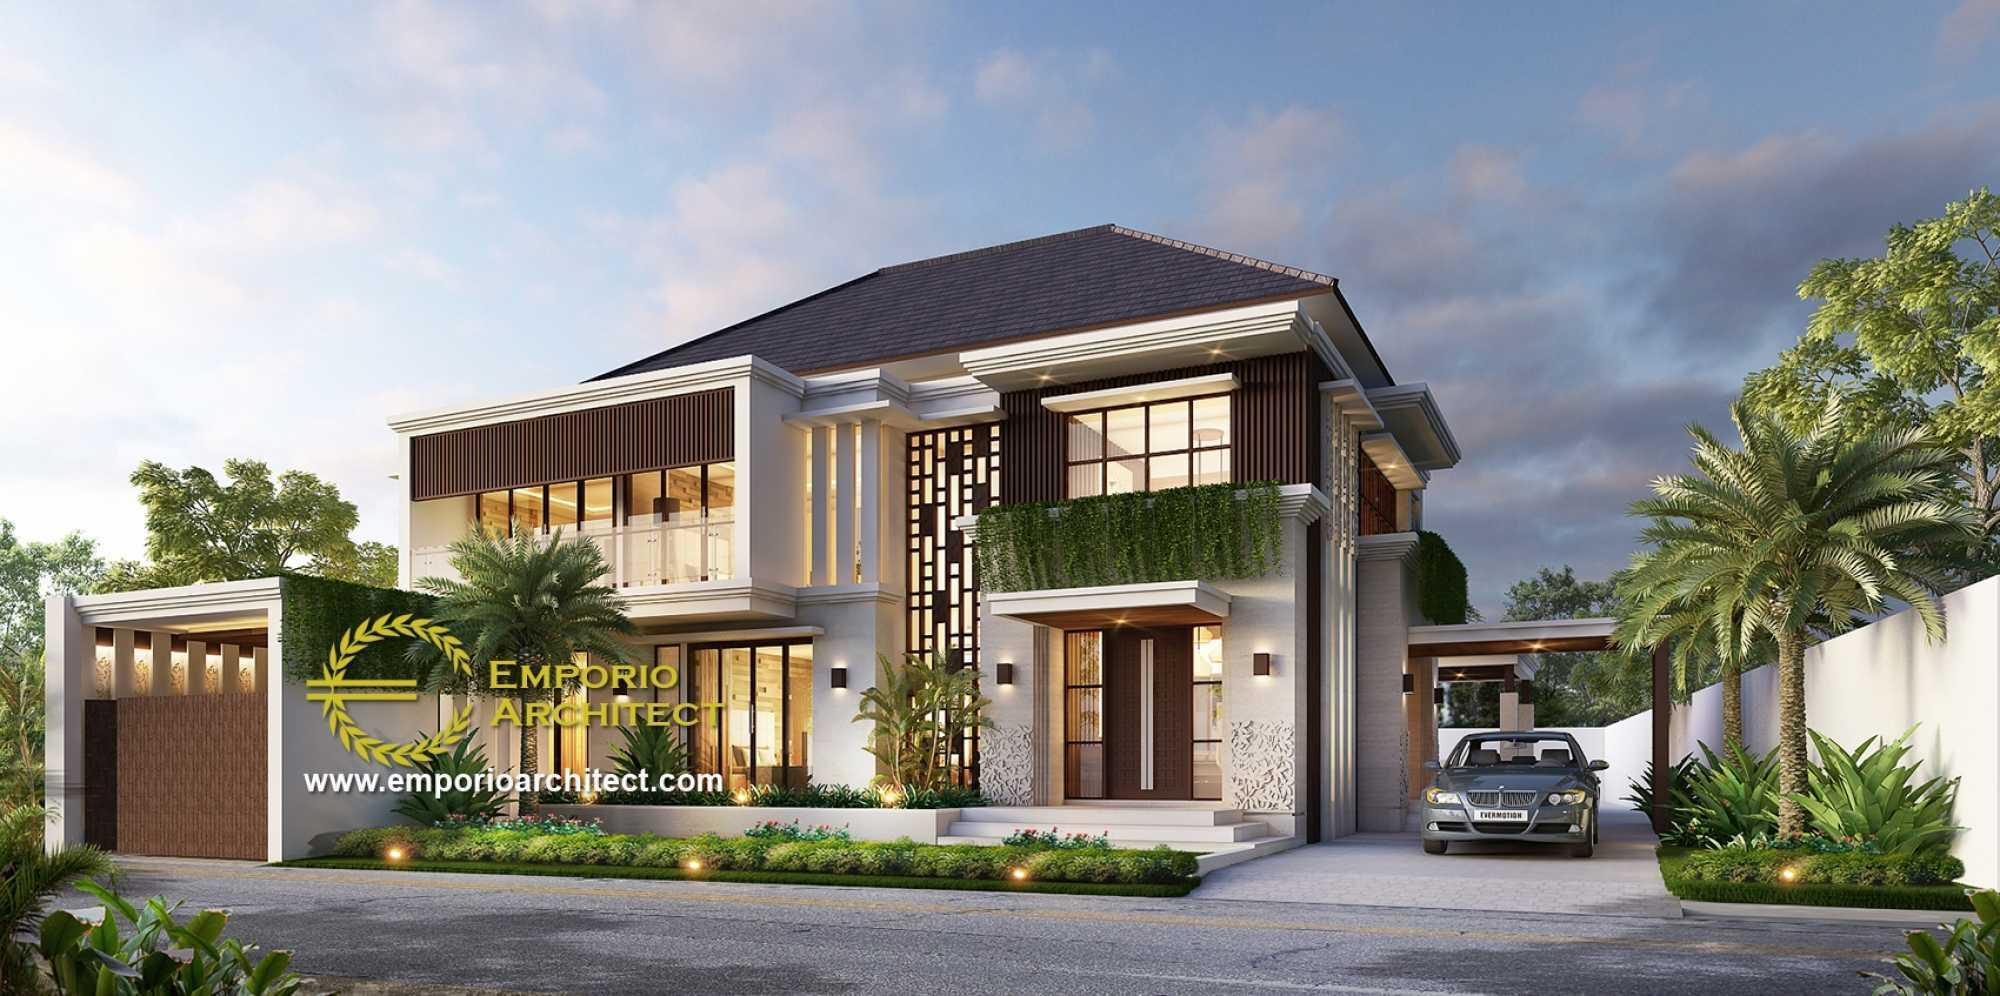 Emporio Architect Desain Rumah Villa Bali Tropis 342 @ Aceh Aceh, Indonesia Aceh, Indonesia Emporio-Architect-Desain-Rumah-Villa-Bali-Tropis-342-Aceh   75445